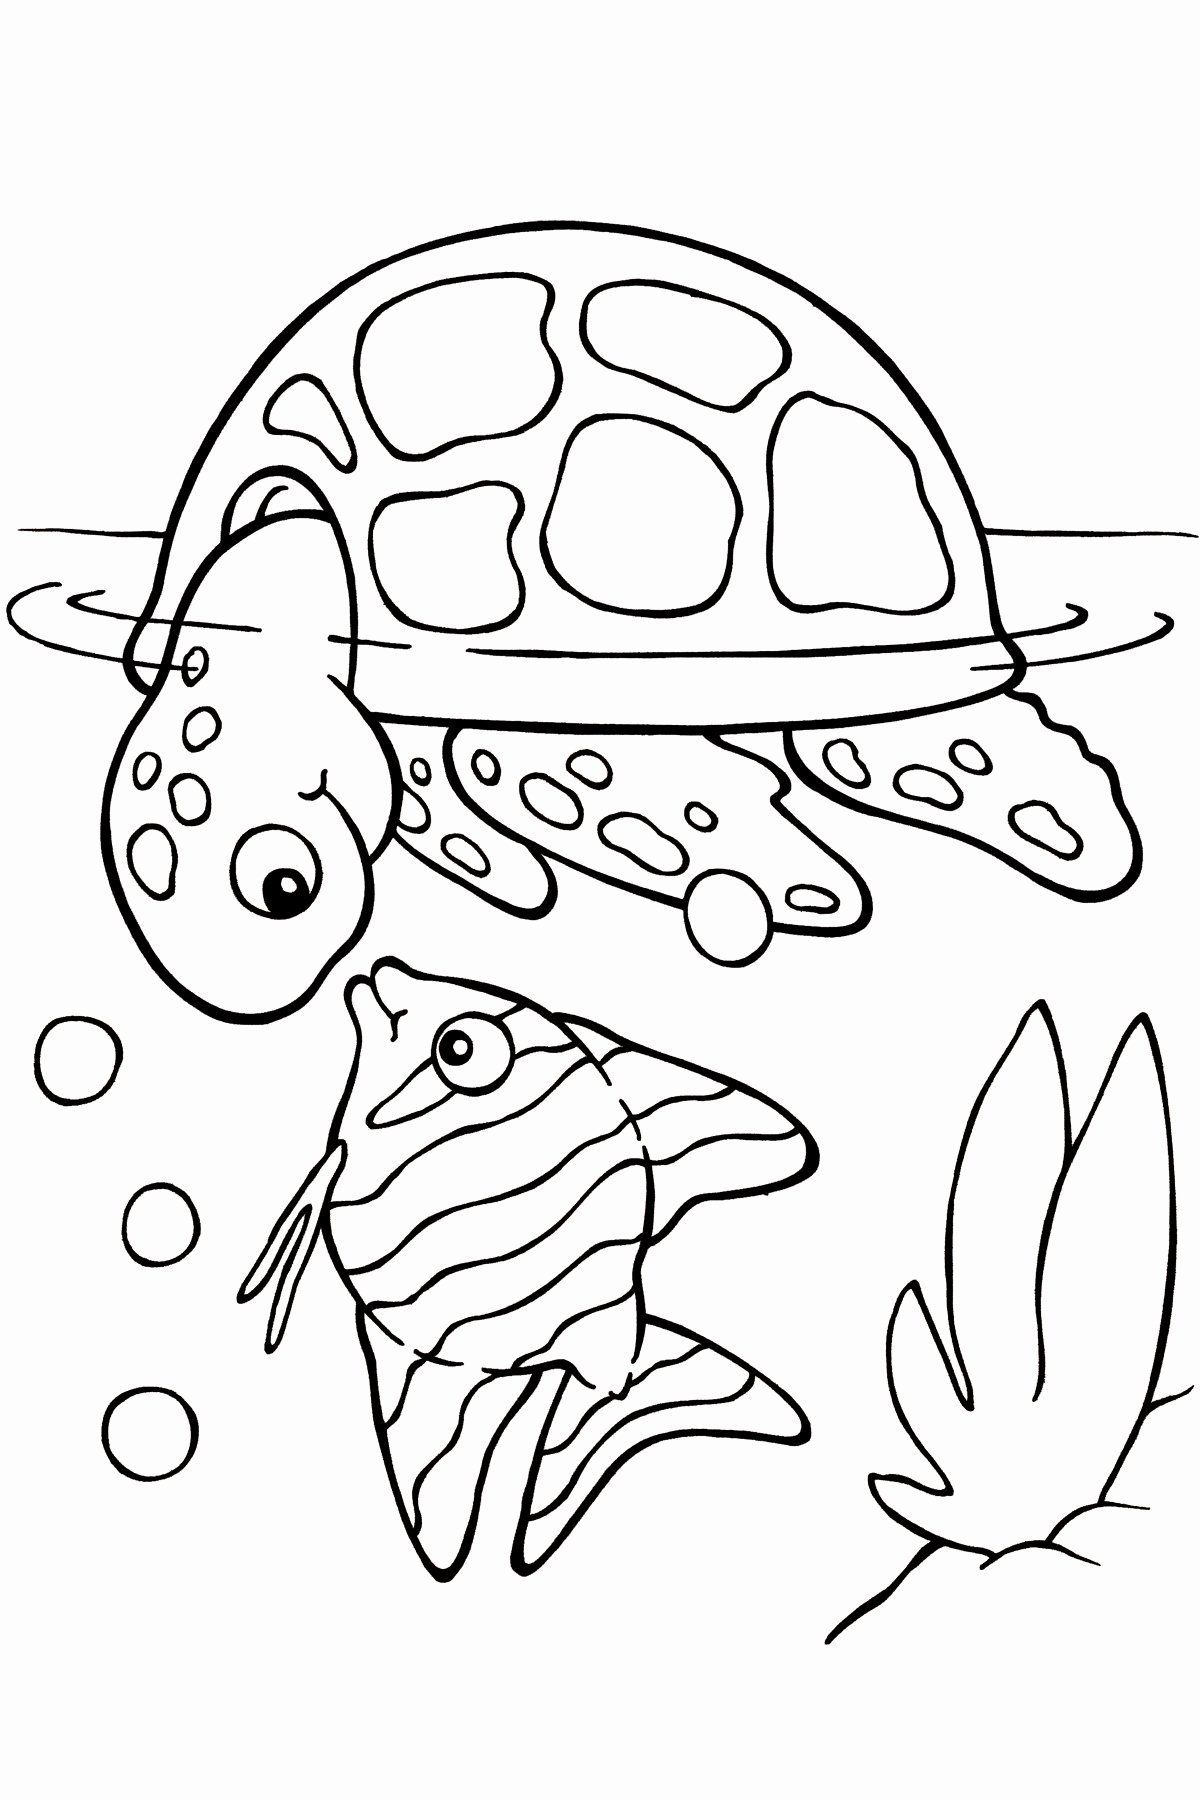 Sea Animals Coloring Book Pdf Awesome Sea Turtle Coloring Pages Getcoloringpages Turtle Coloring Pages Animal Coloring Pages Ocean Coloring Pages